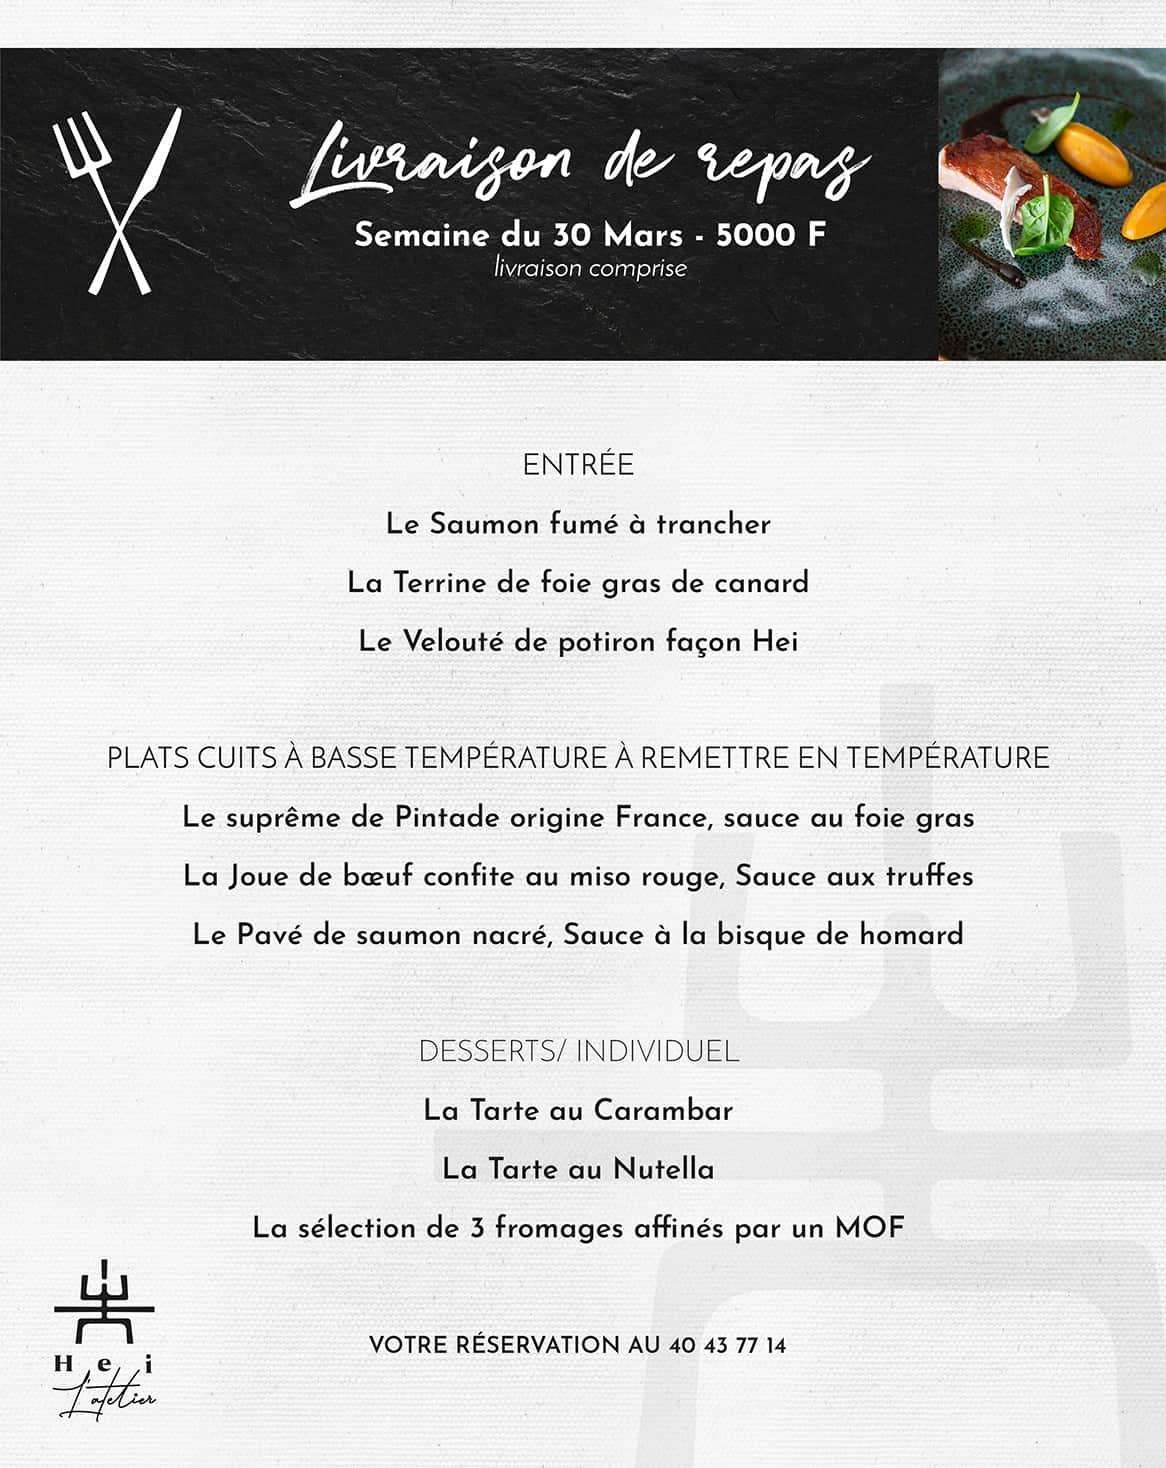 lightbox-atelier-menu